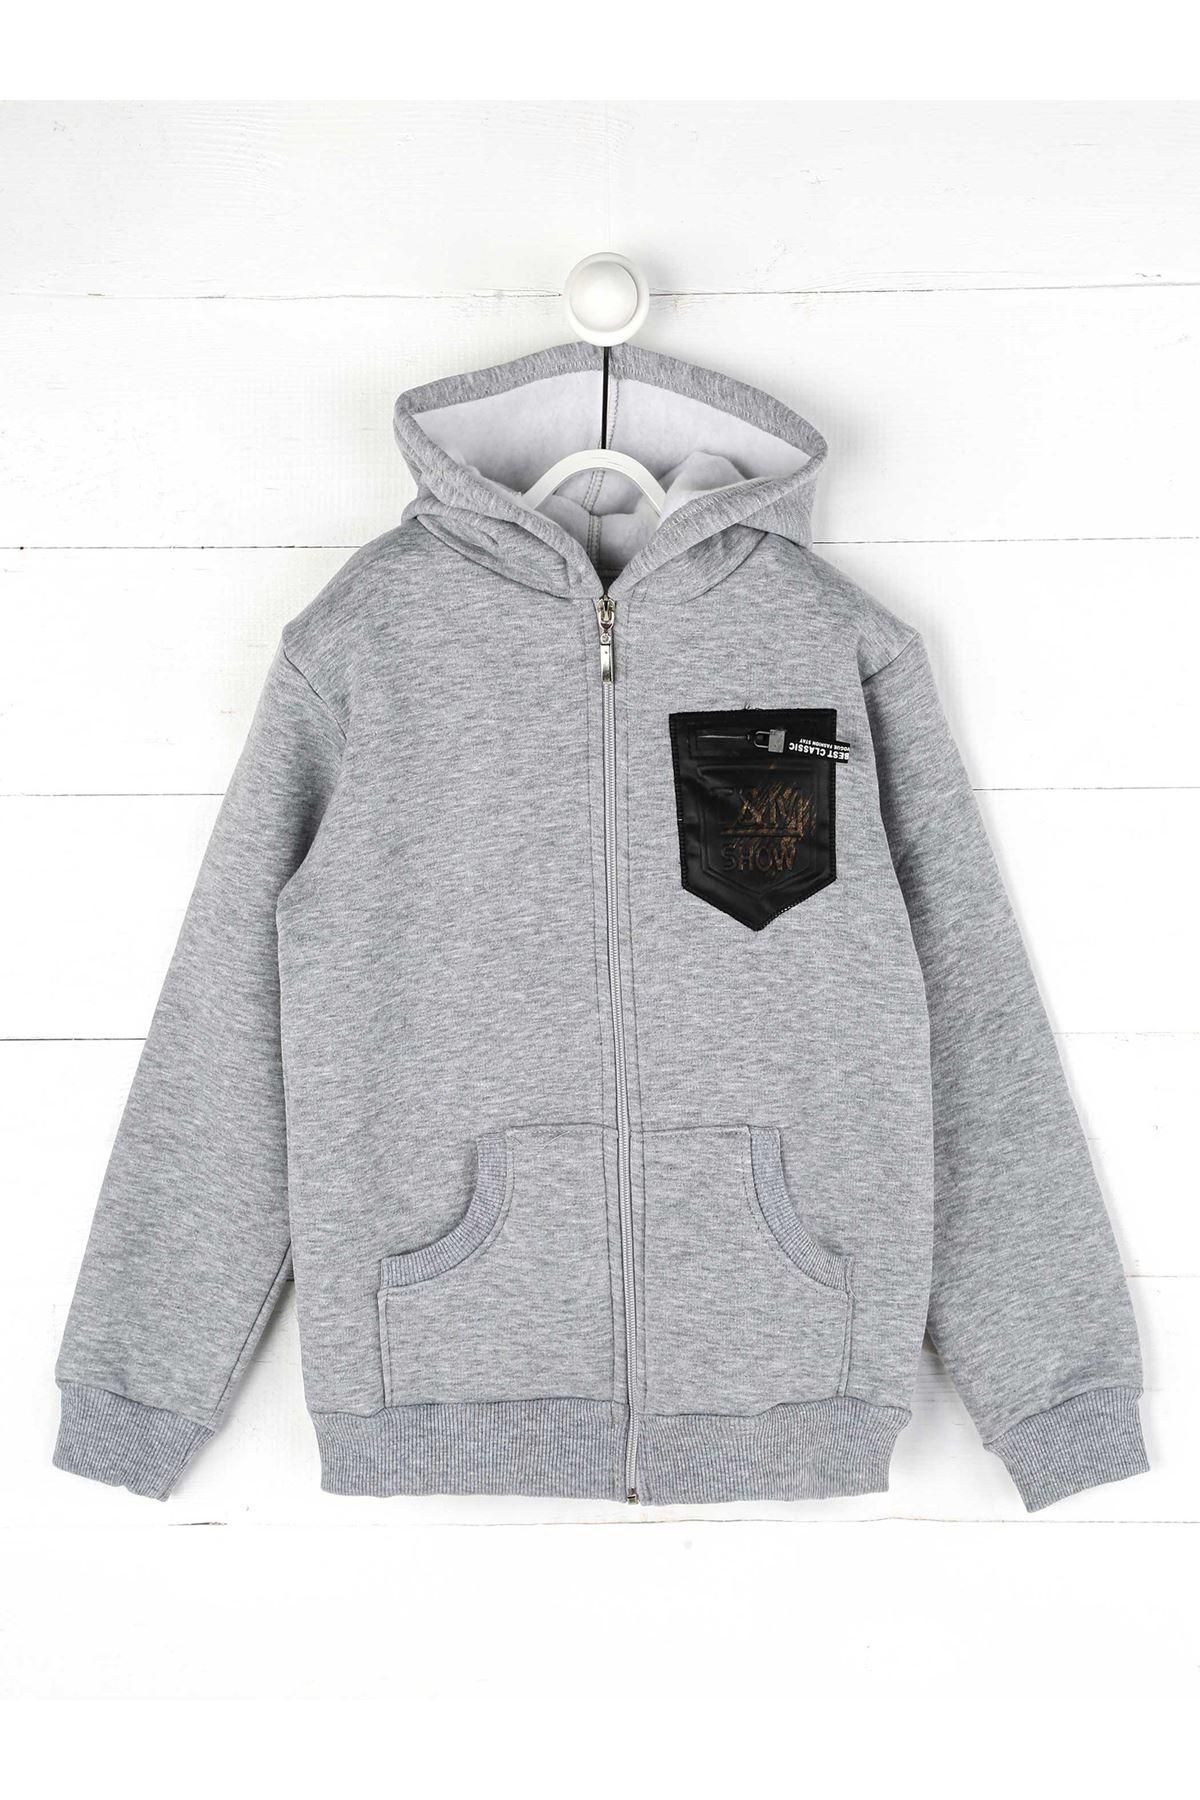 Gray Winter Male Child Sweatshirt